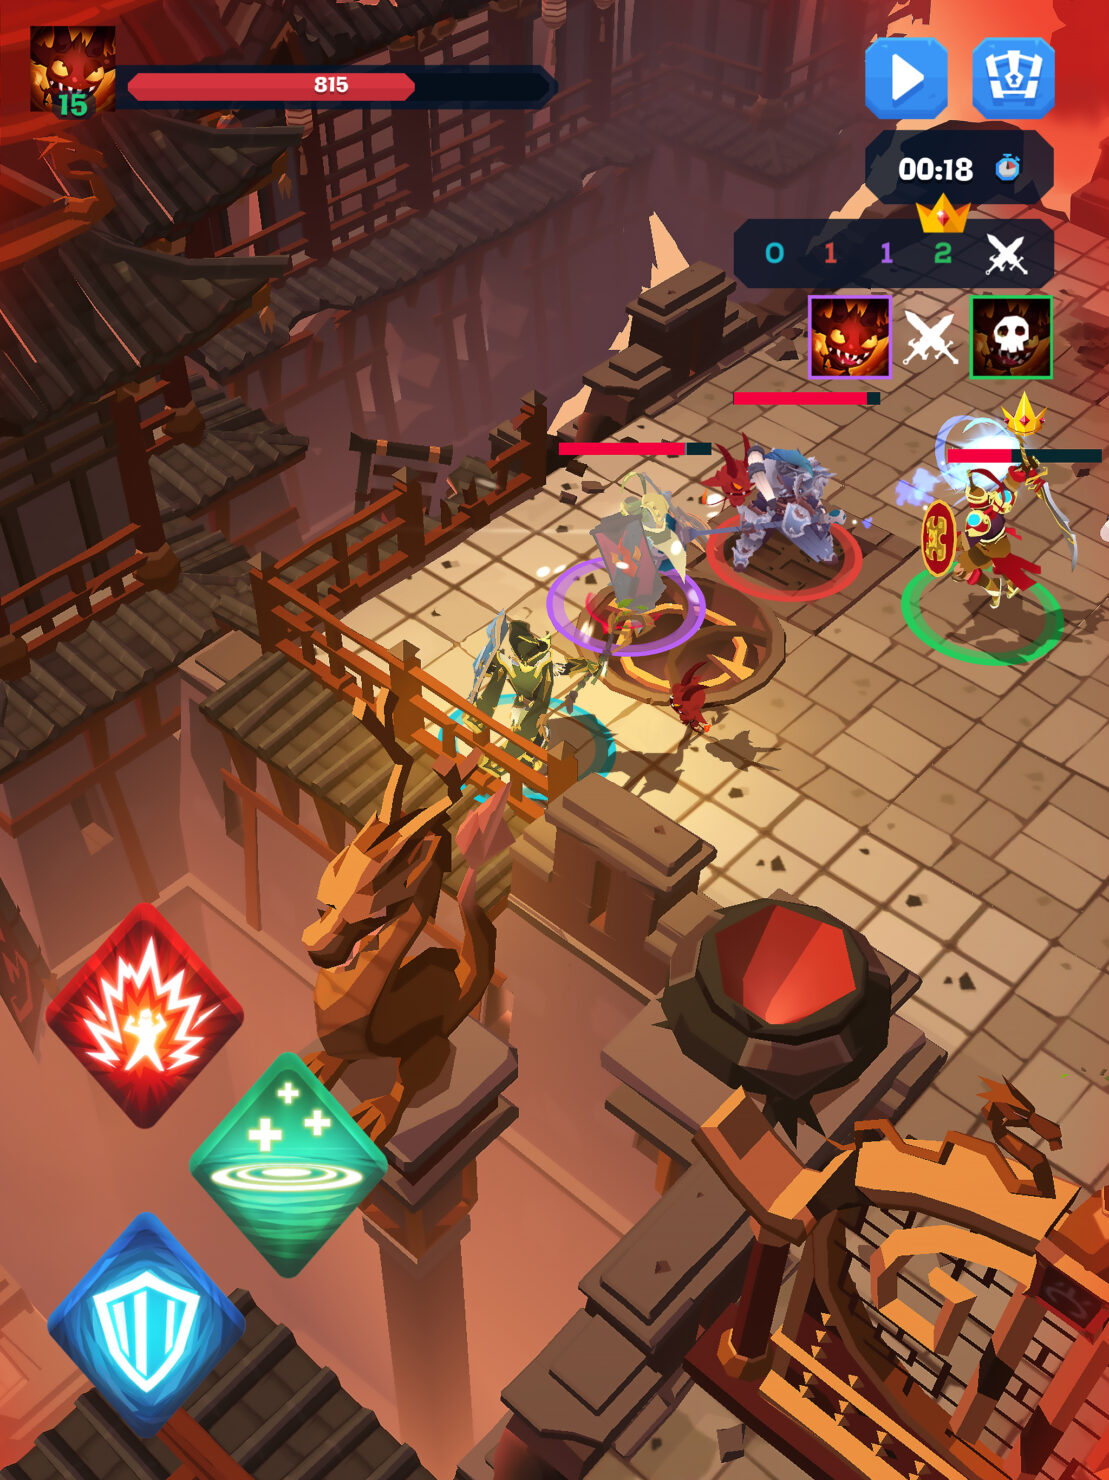 mq_screenshot_pvp-arena-fire_en